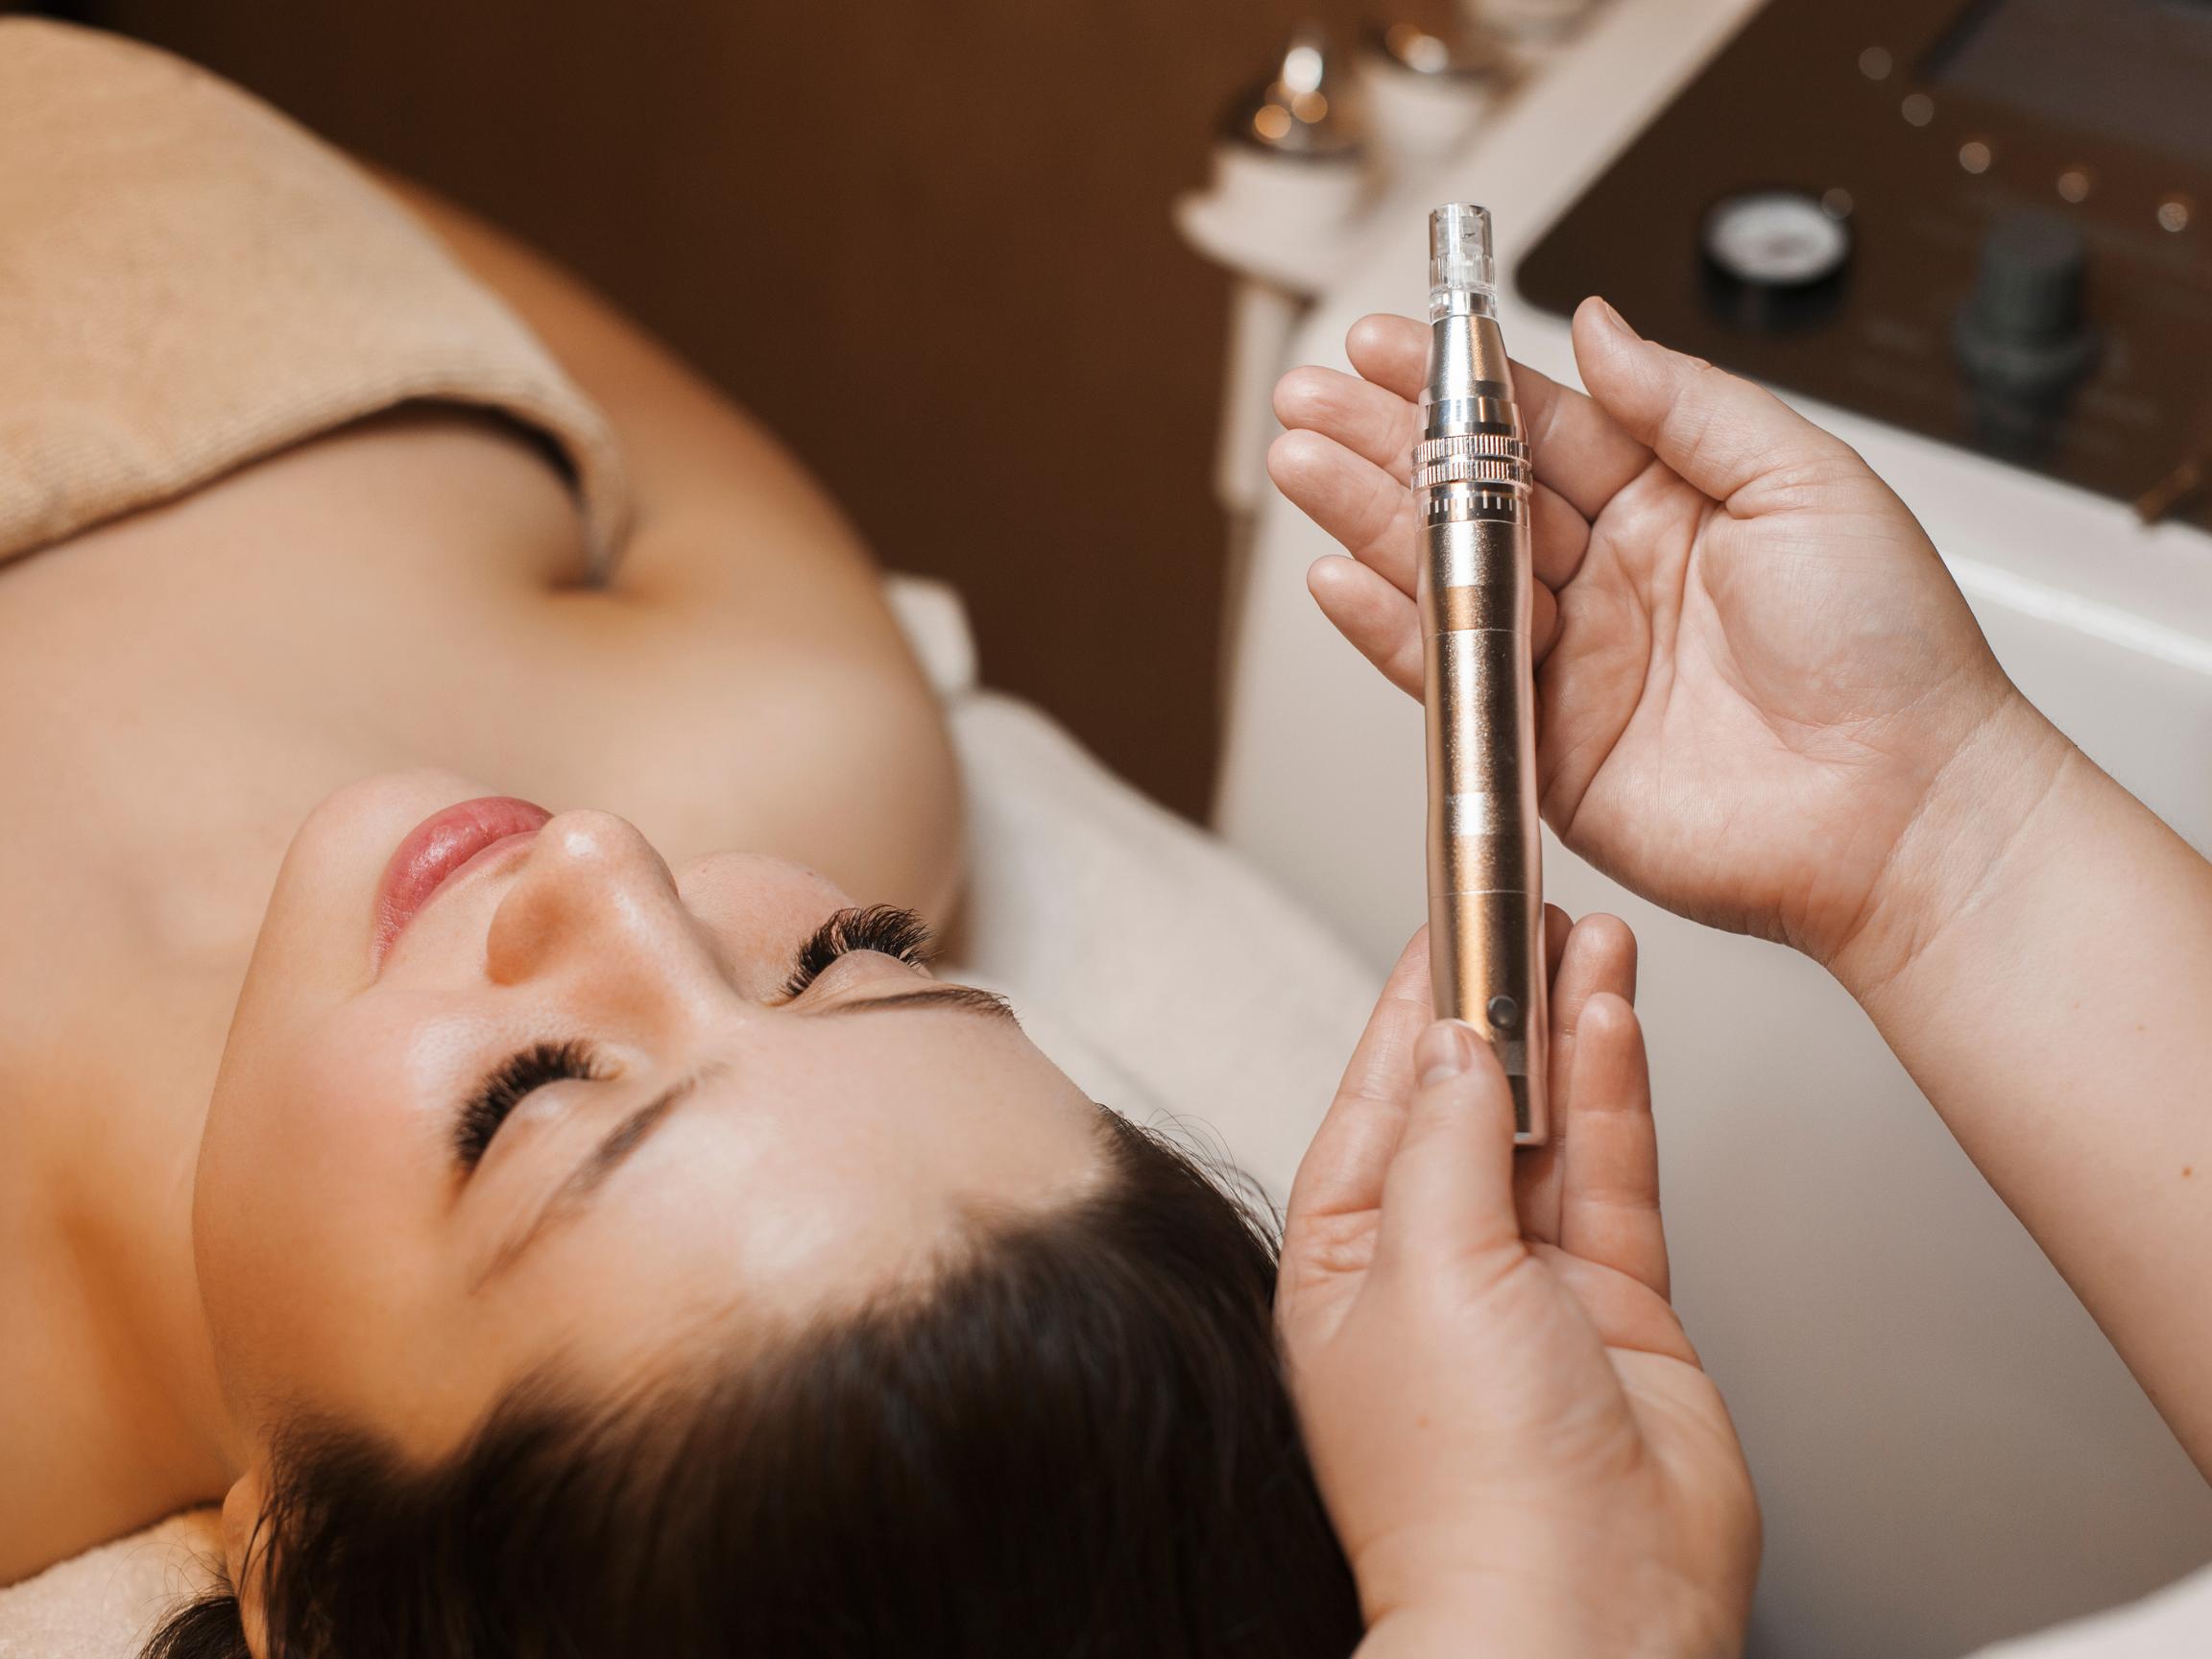 woman lying down preparing for microneedling treatment